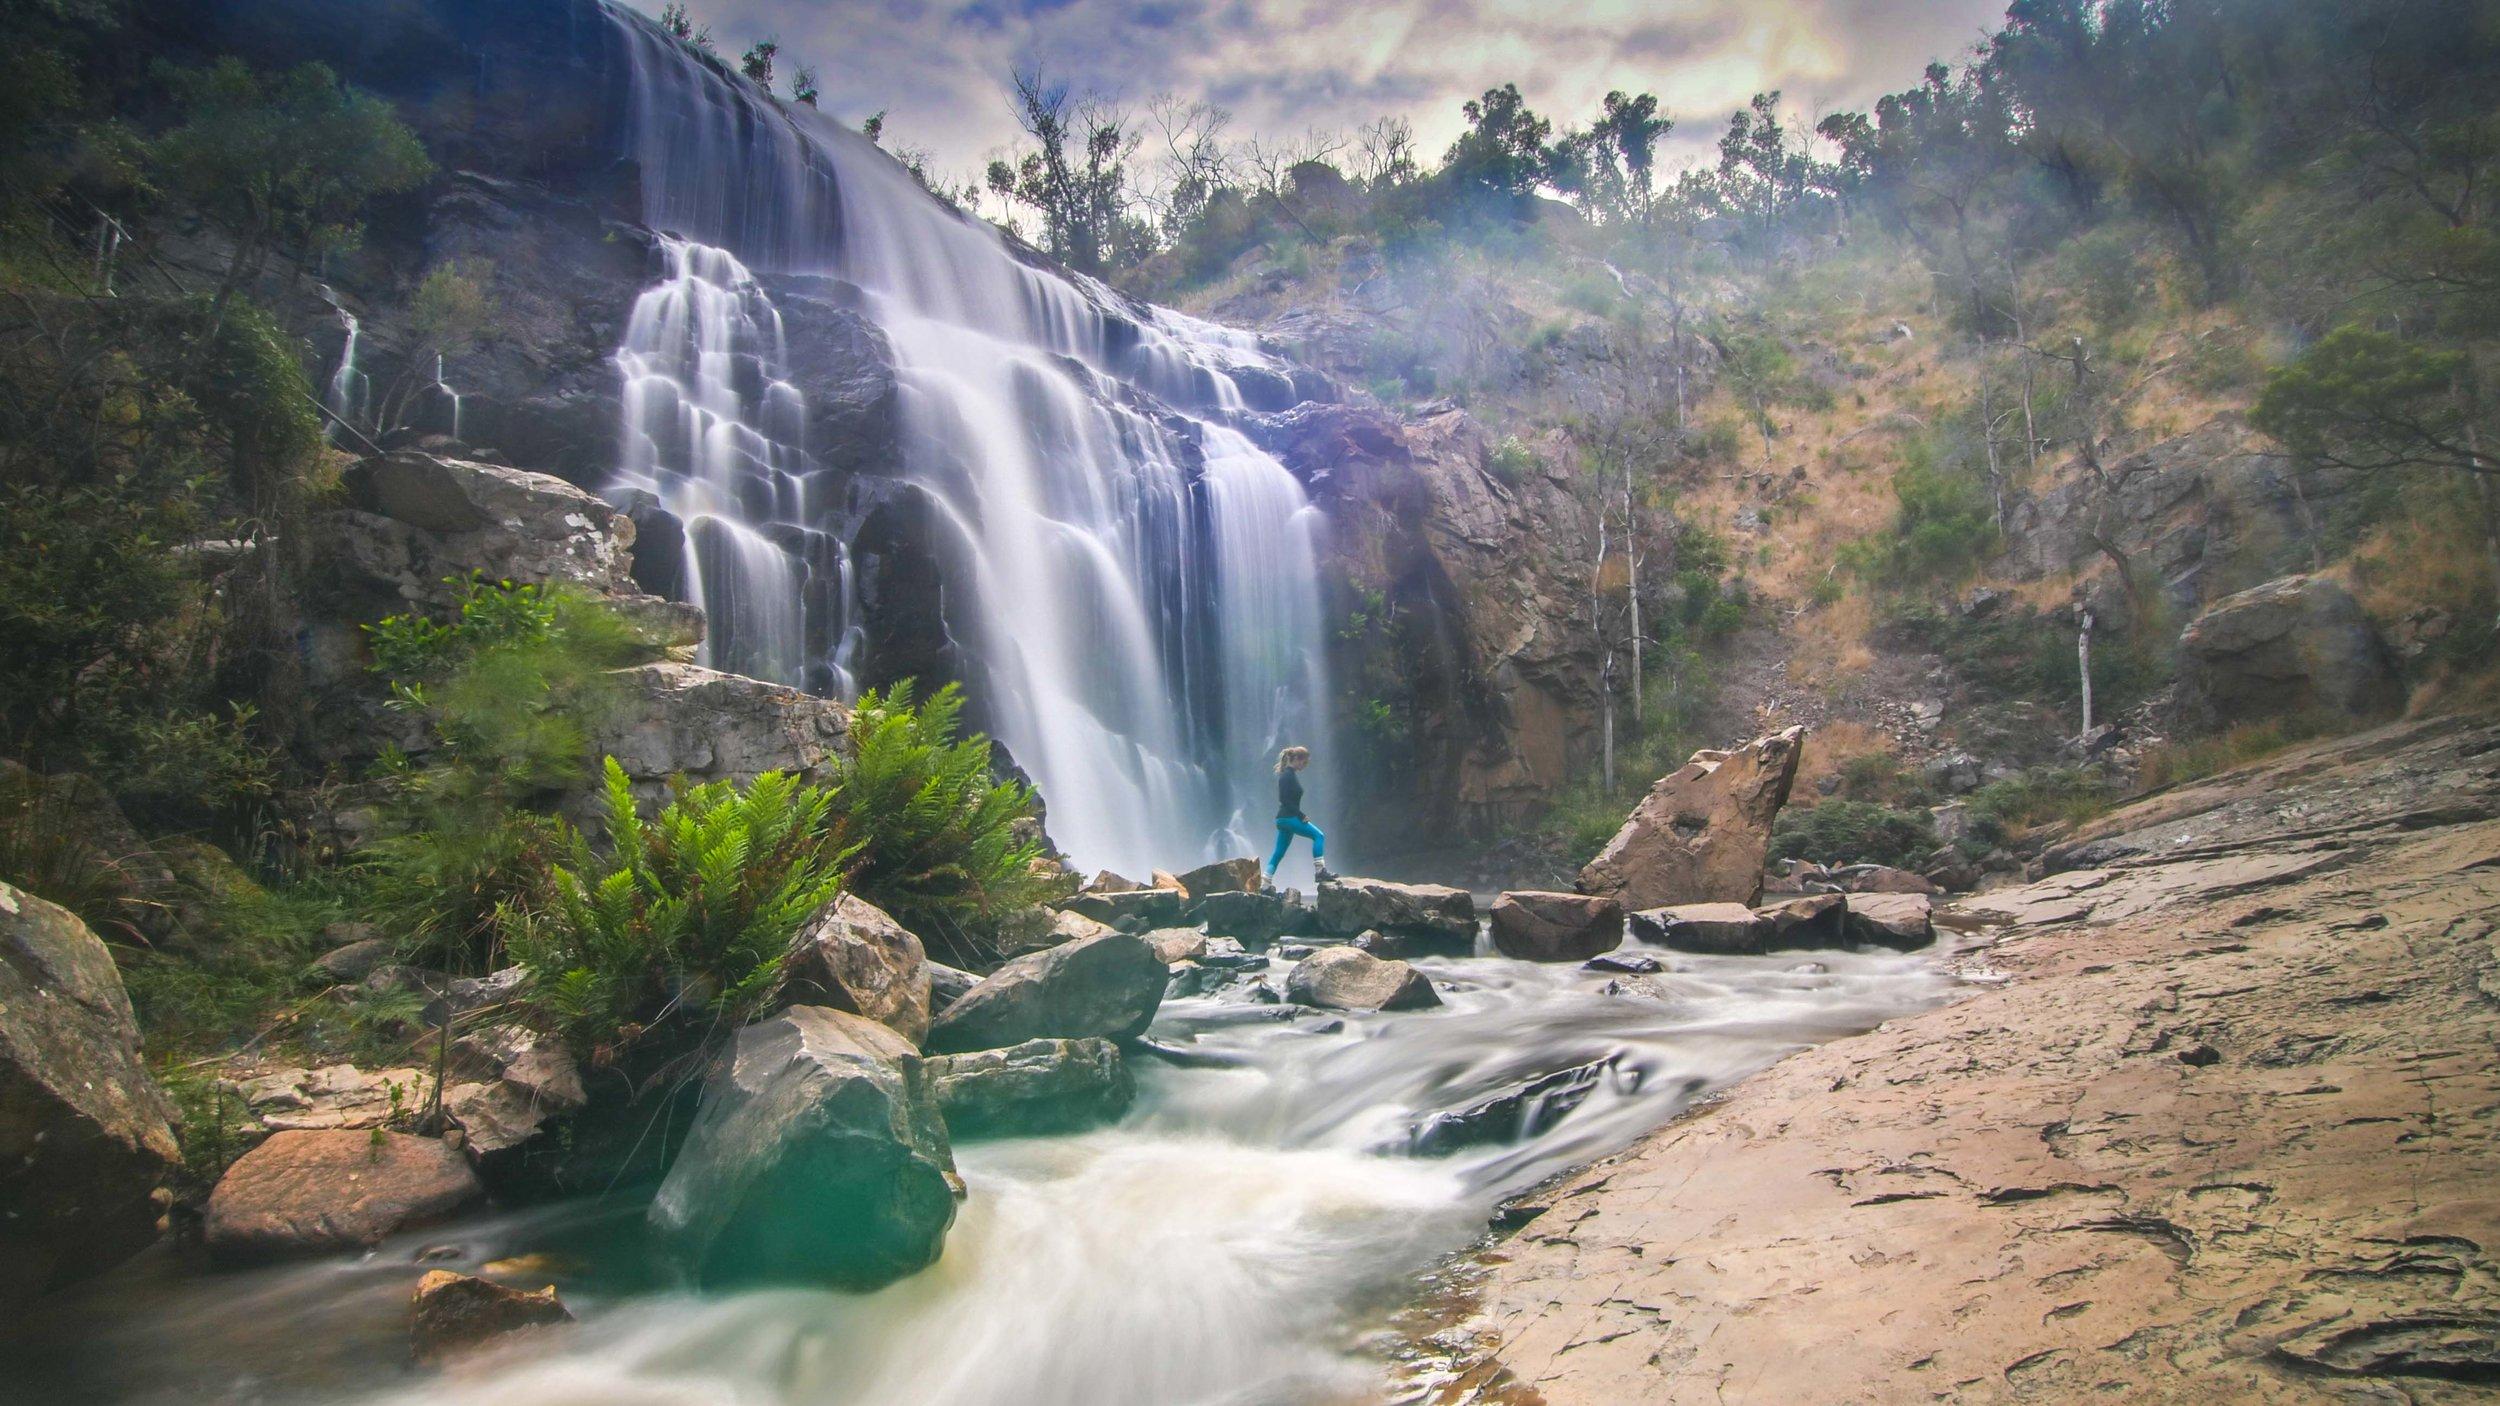 MacKenzie Falls, Grampians National PArk, VIctoria, Australia